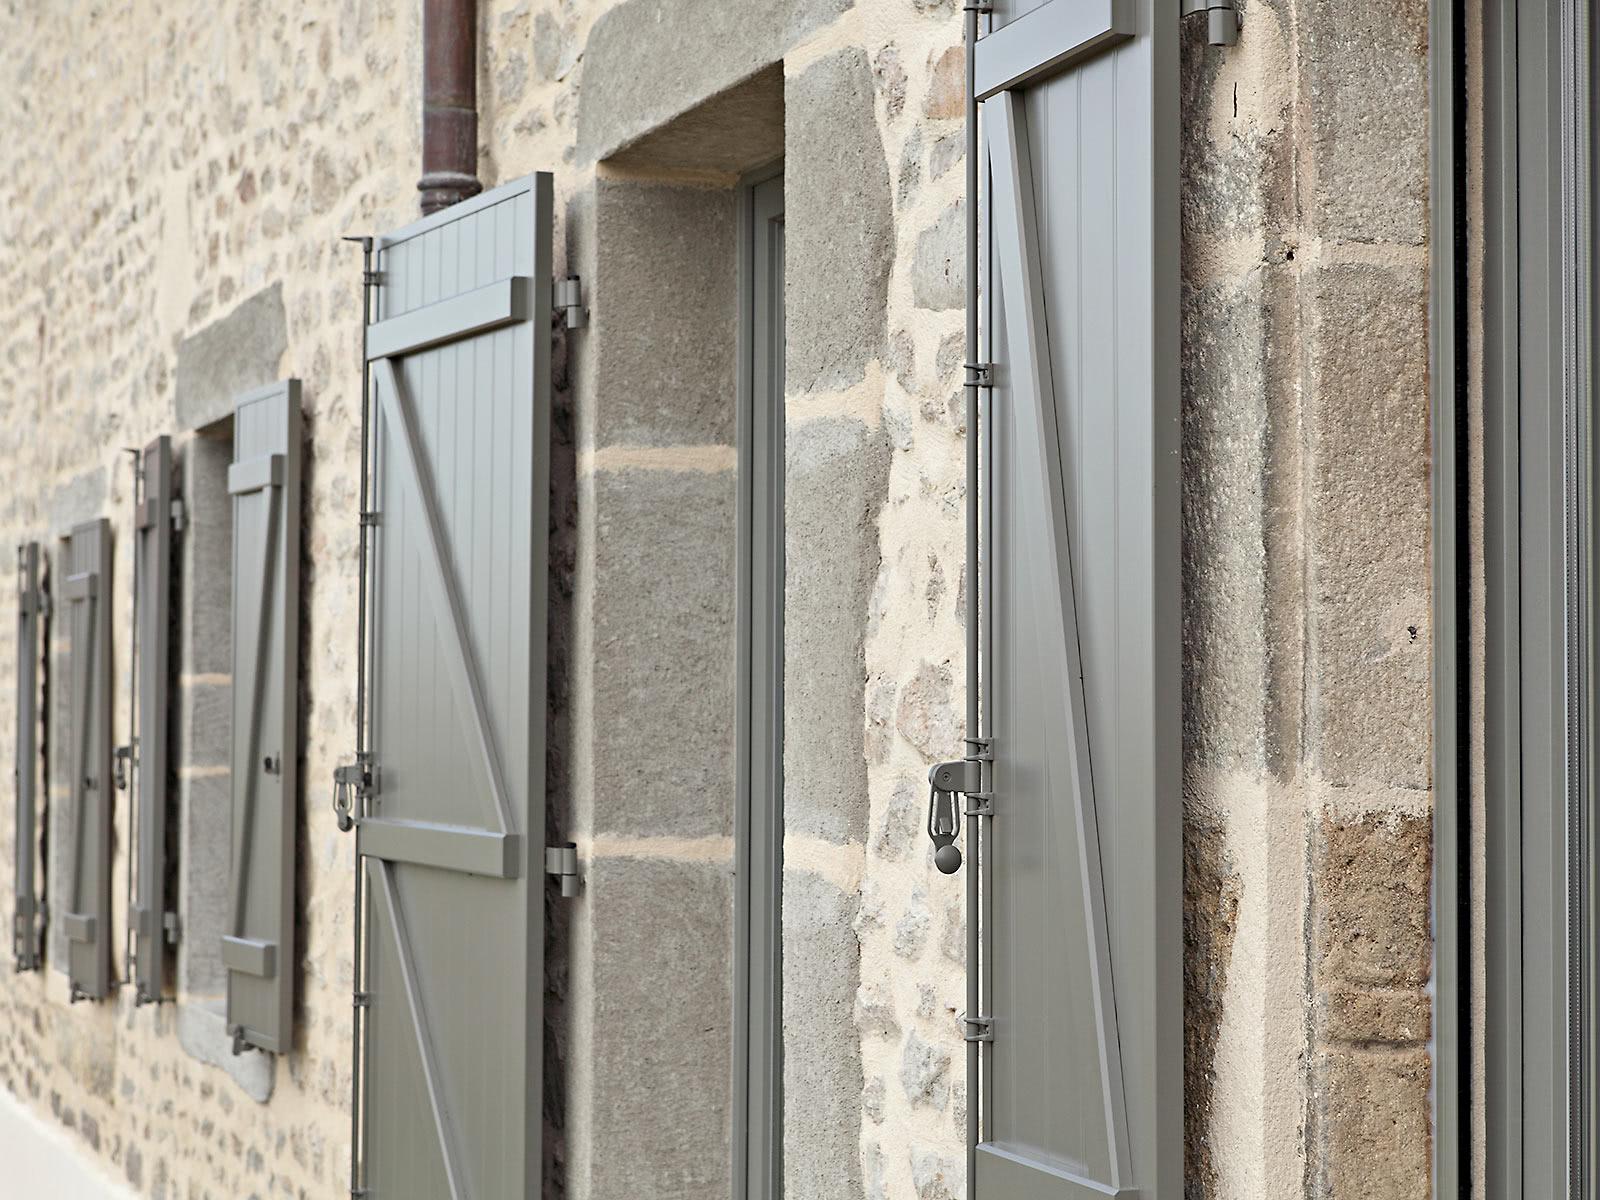 Heat Insulating Shutters Energy Efficiency